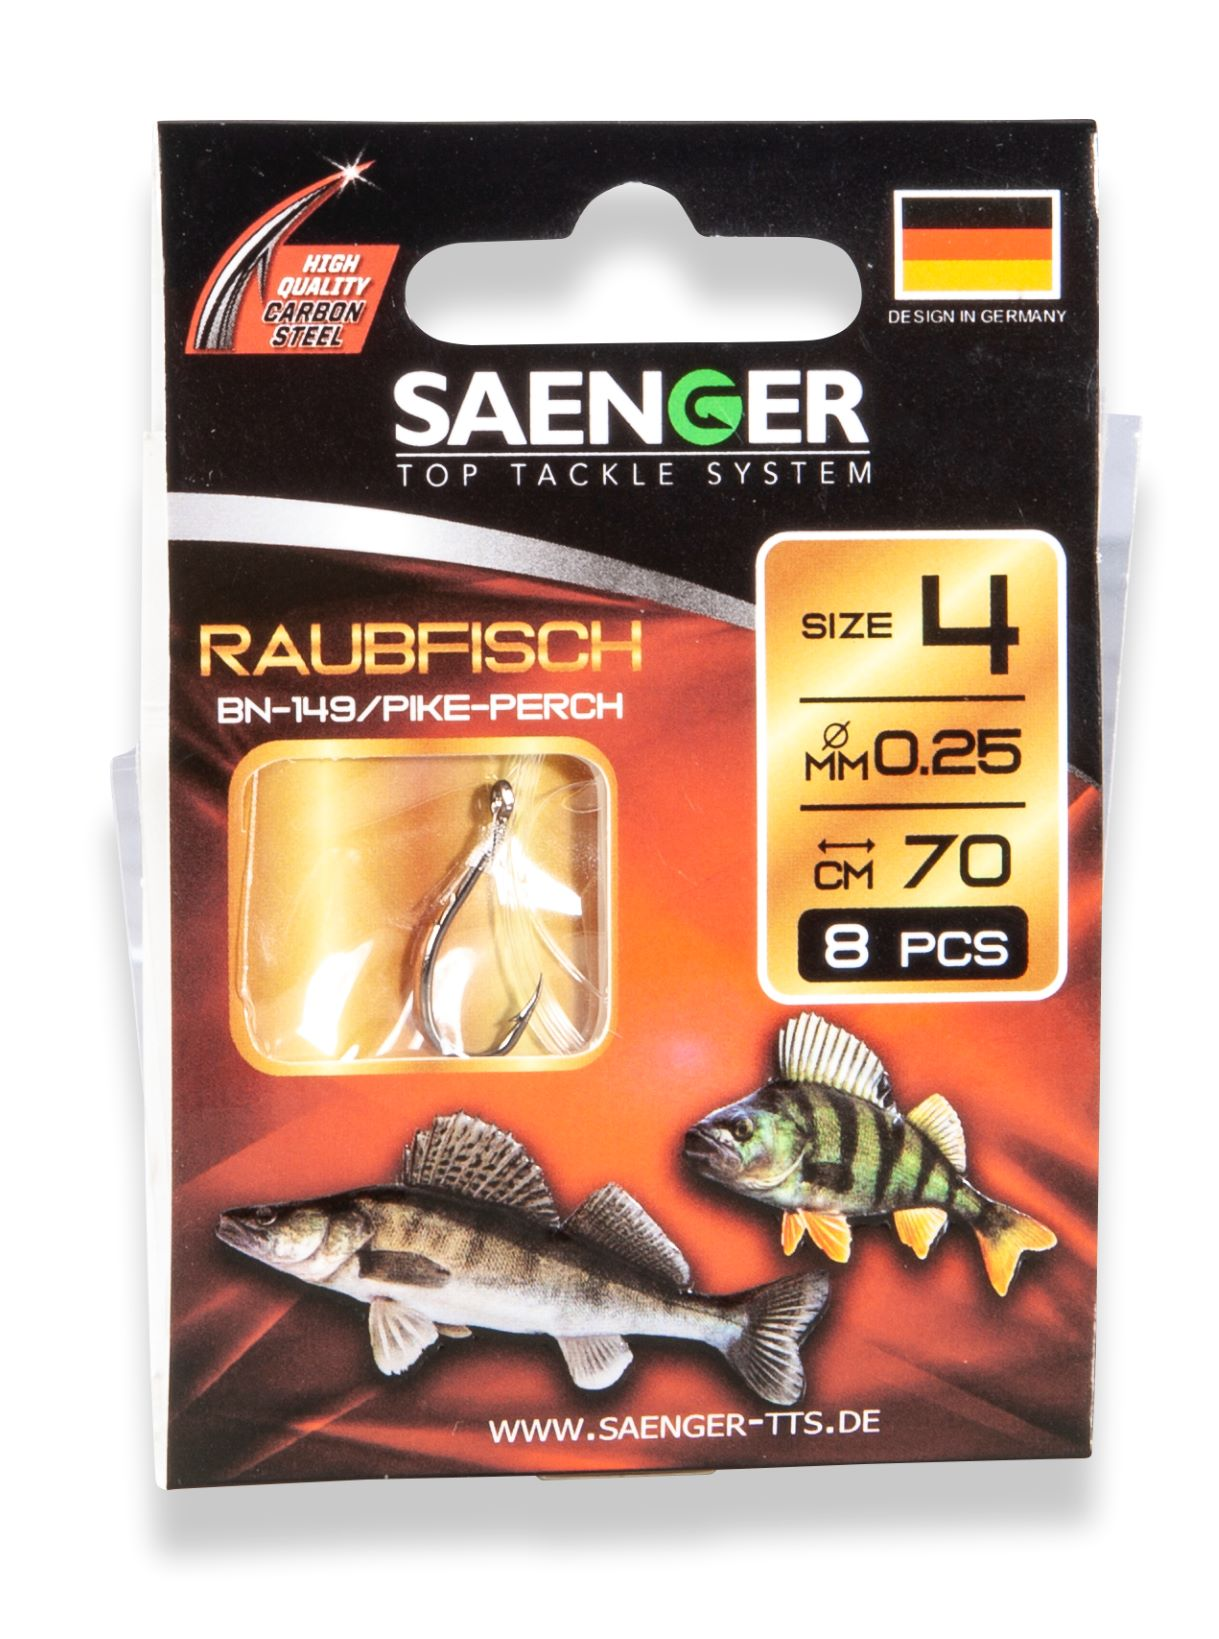 Saenger Návazec na chytání dravých ryb Raubfisch vel. 2, 8 ks/bal